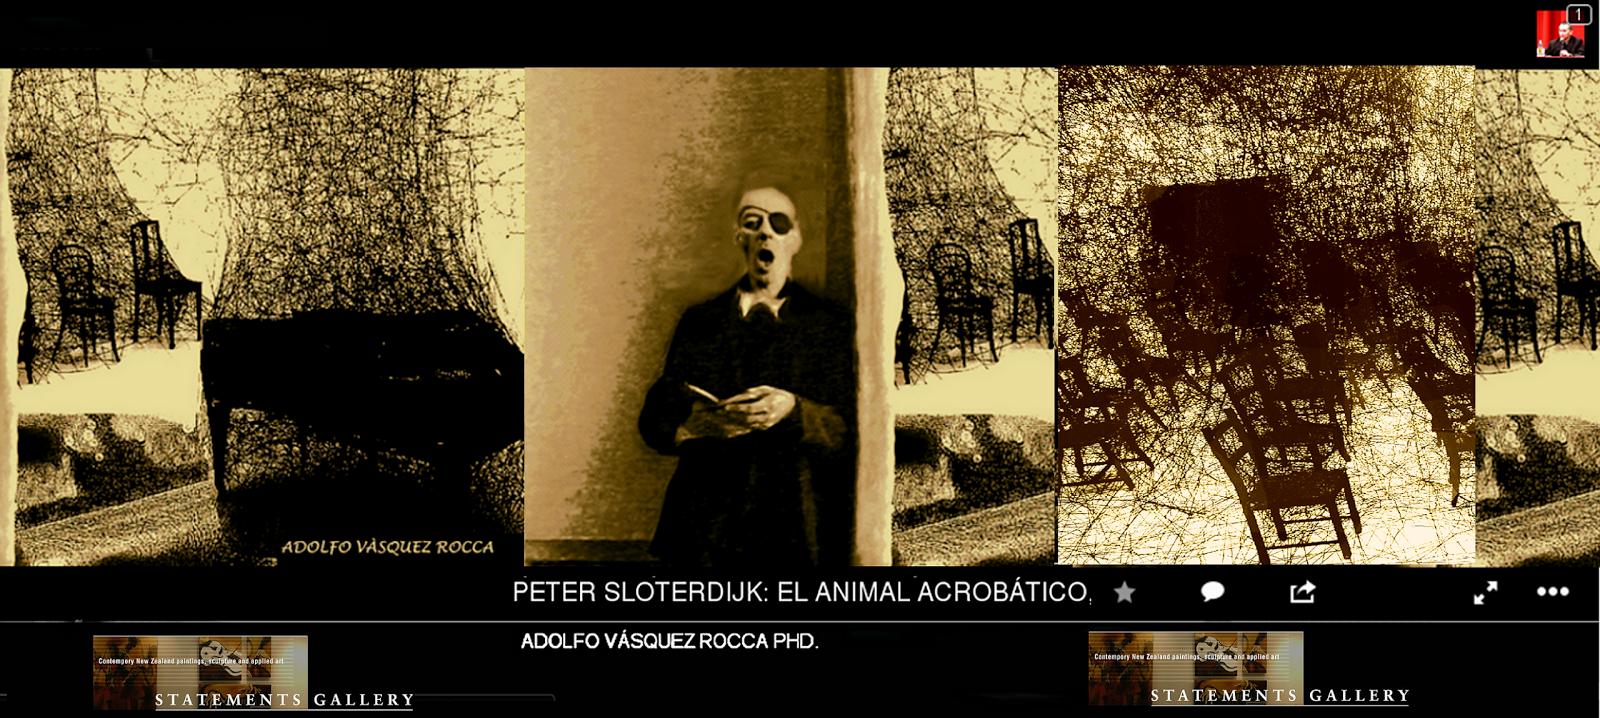 http://4.bp.blogspot.com/-FHIAJUumqmM/UnqZ_zAvdKI/AAAAAAAALys/CpcXvdNx2Ss/s1600/Obra+2_+SLOTERDIJK+EL+ANIMAL+ACROBATICO+_+Obra+Dr.+Adolfo+Vasquez+Rocca+ART+70+.png